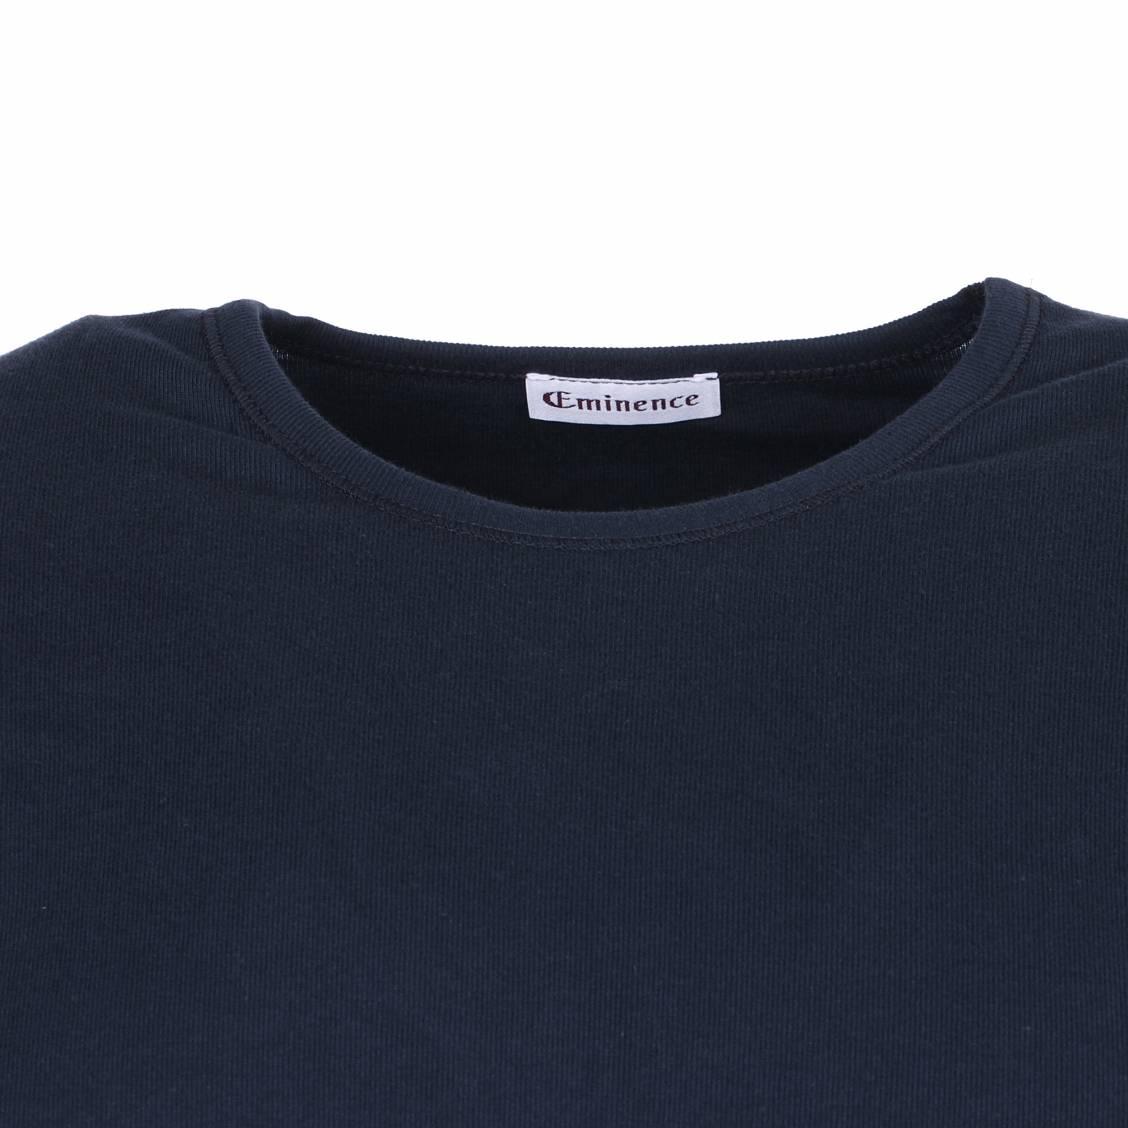 tee-shirt hypoallergénique bleu marine